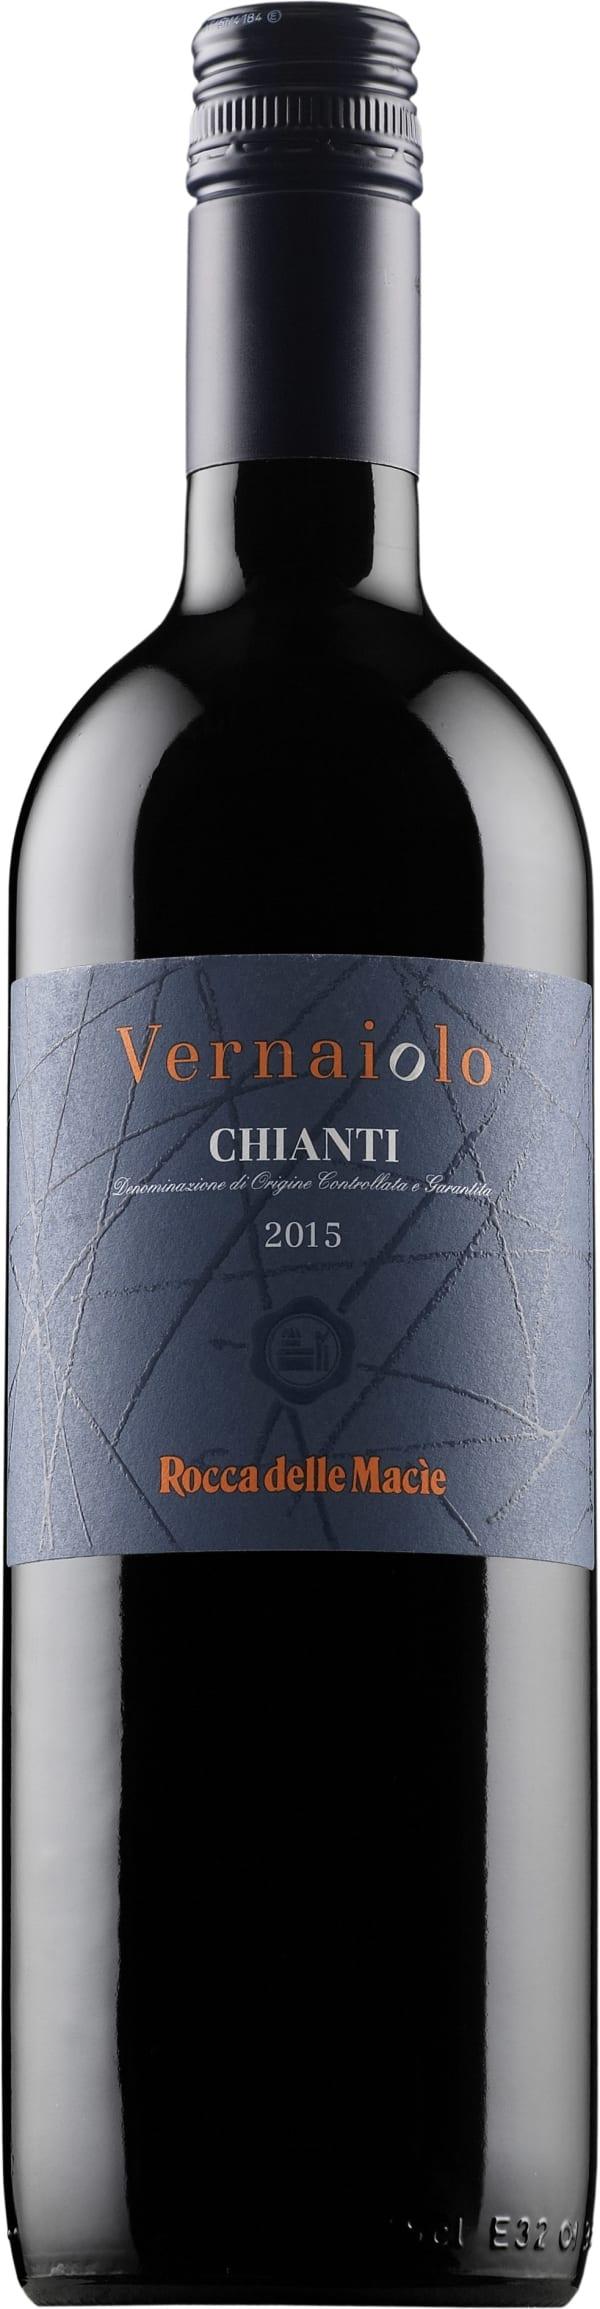 Vernaiolo Chianti 2015